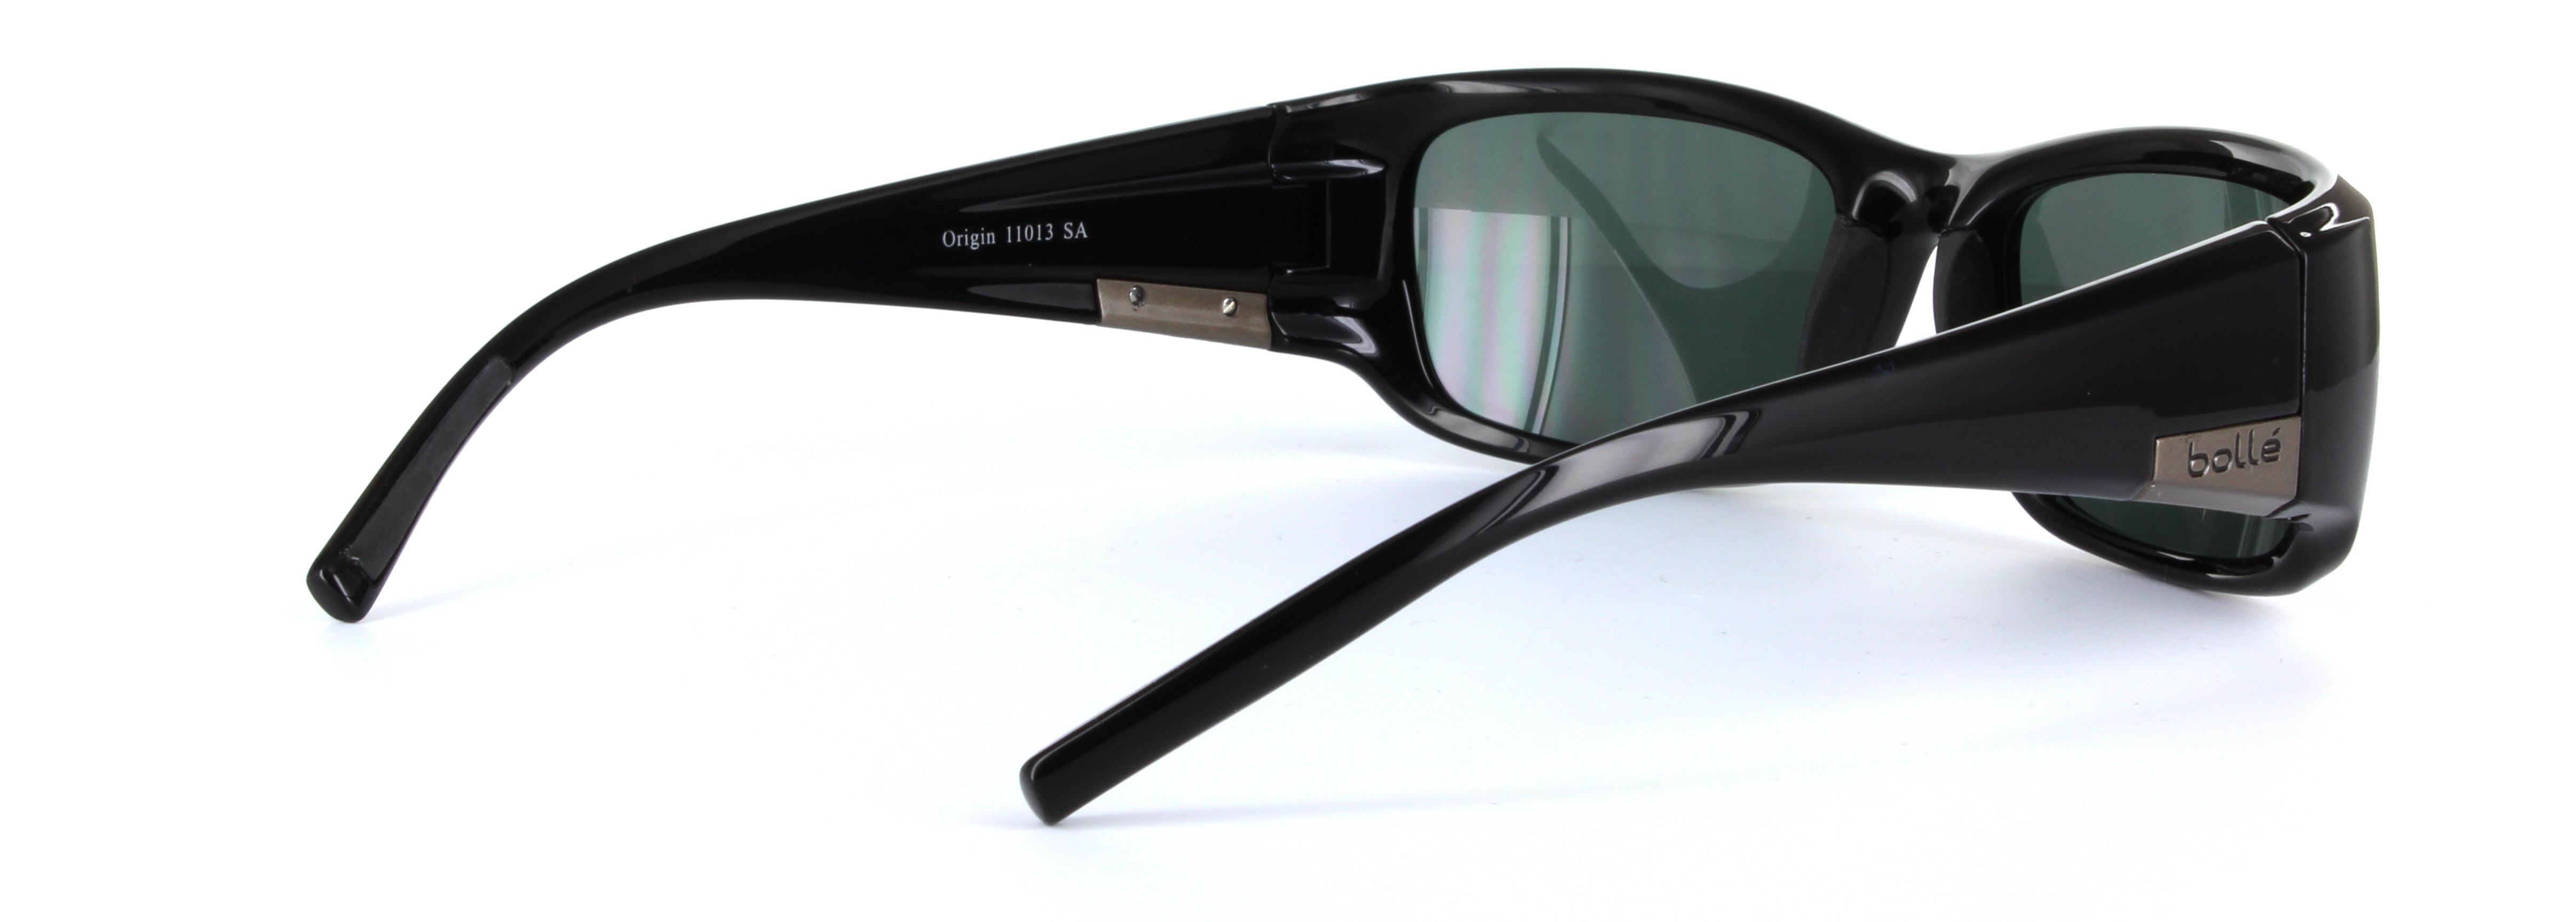 534258ffee1 Bolle Origin Sunglasses